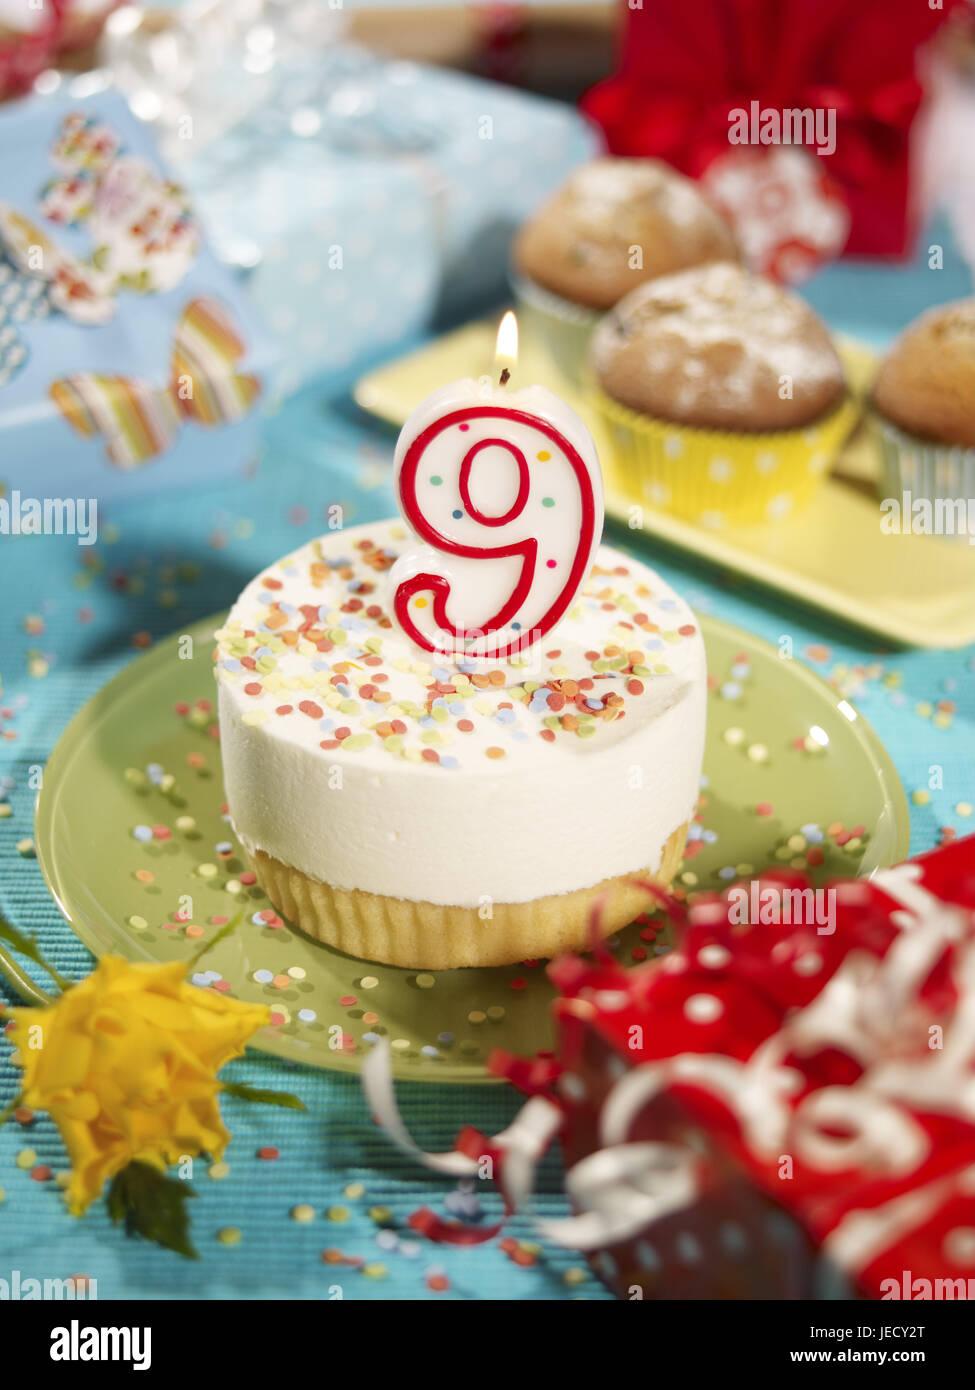 Birthday Tartlets Skyer Number 9 Of Muffin Presents Confetti Cakes Tortelett Jubilee Celebrate Surprise